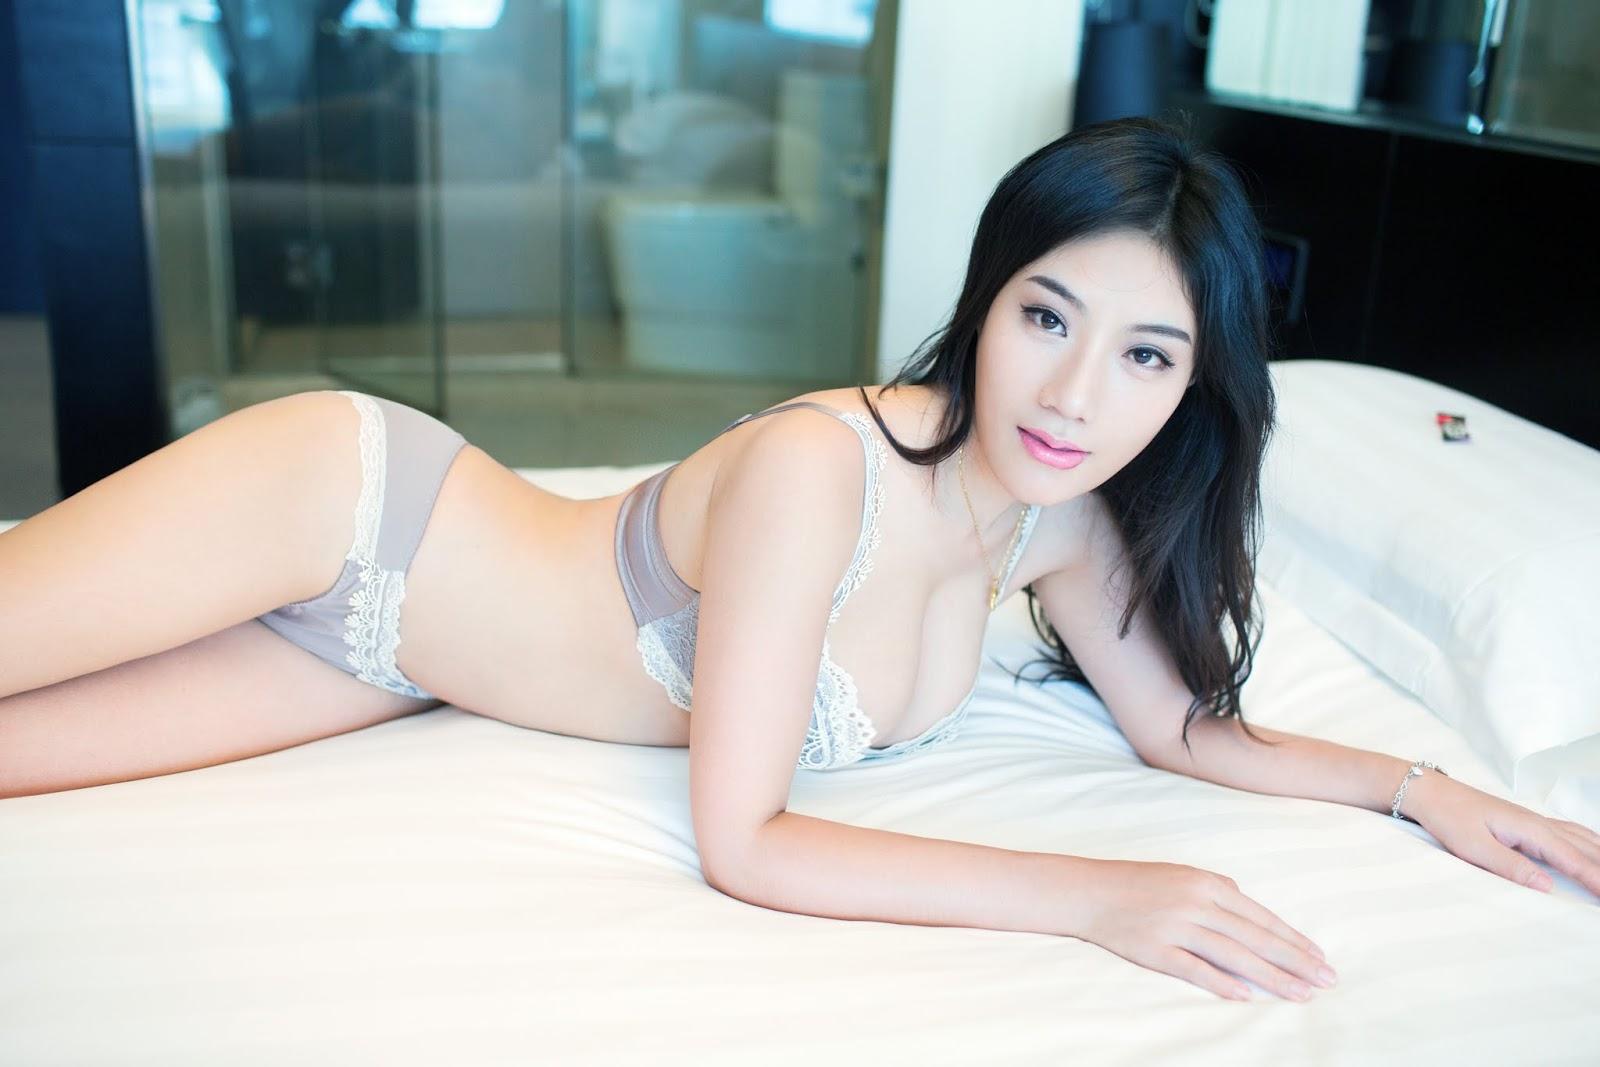 %25C2%25AC%252BO 02 - Hot Sexy Model TUIGIRL NO.46 Nude